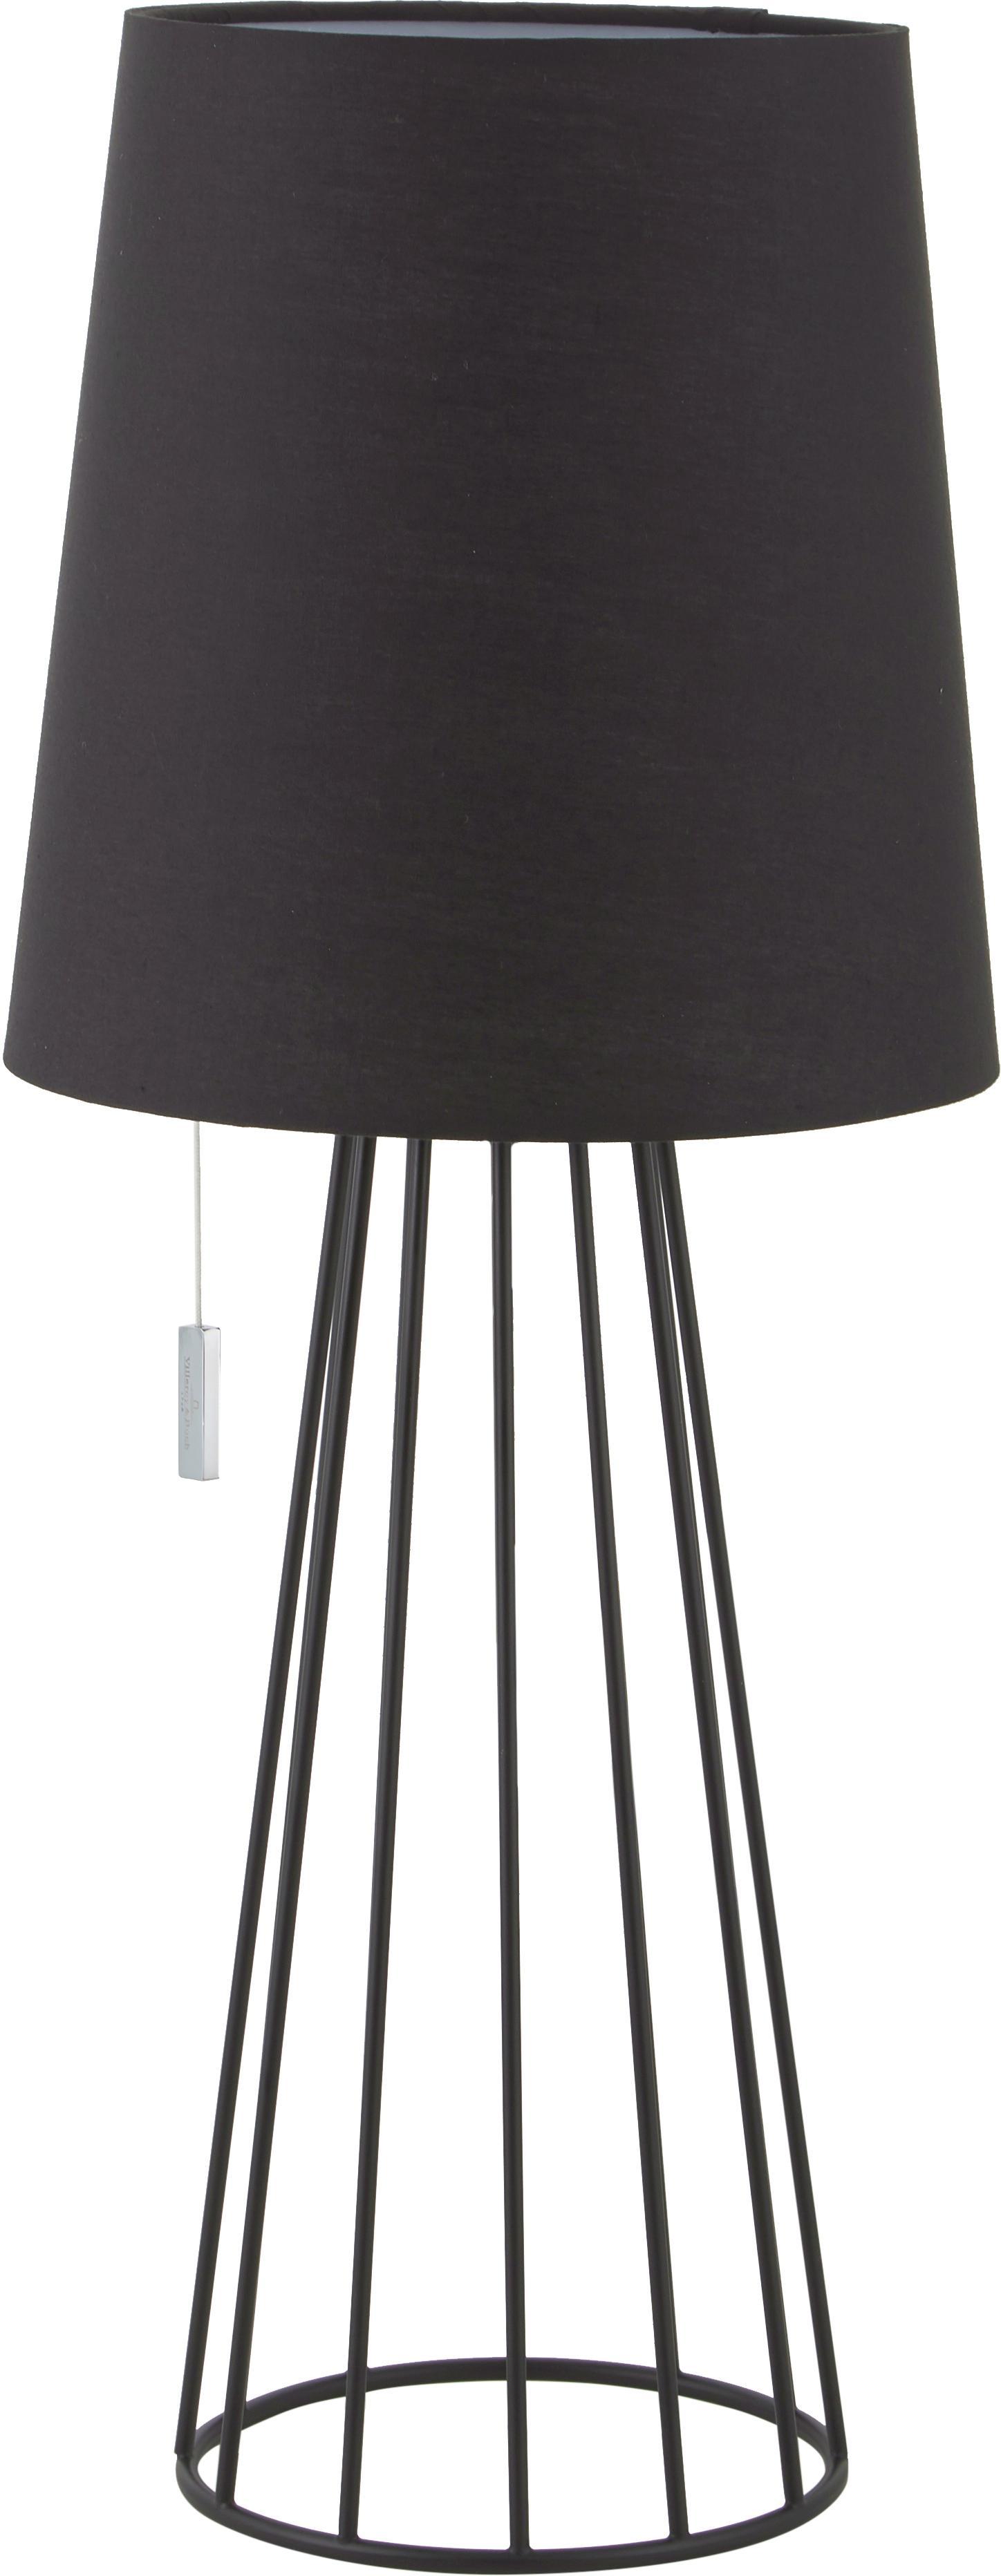 Lámpara de mesa grande Mailand, Negro, Ø 23 x Al 59 cm